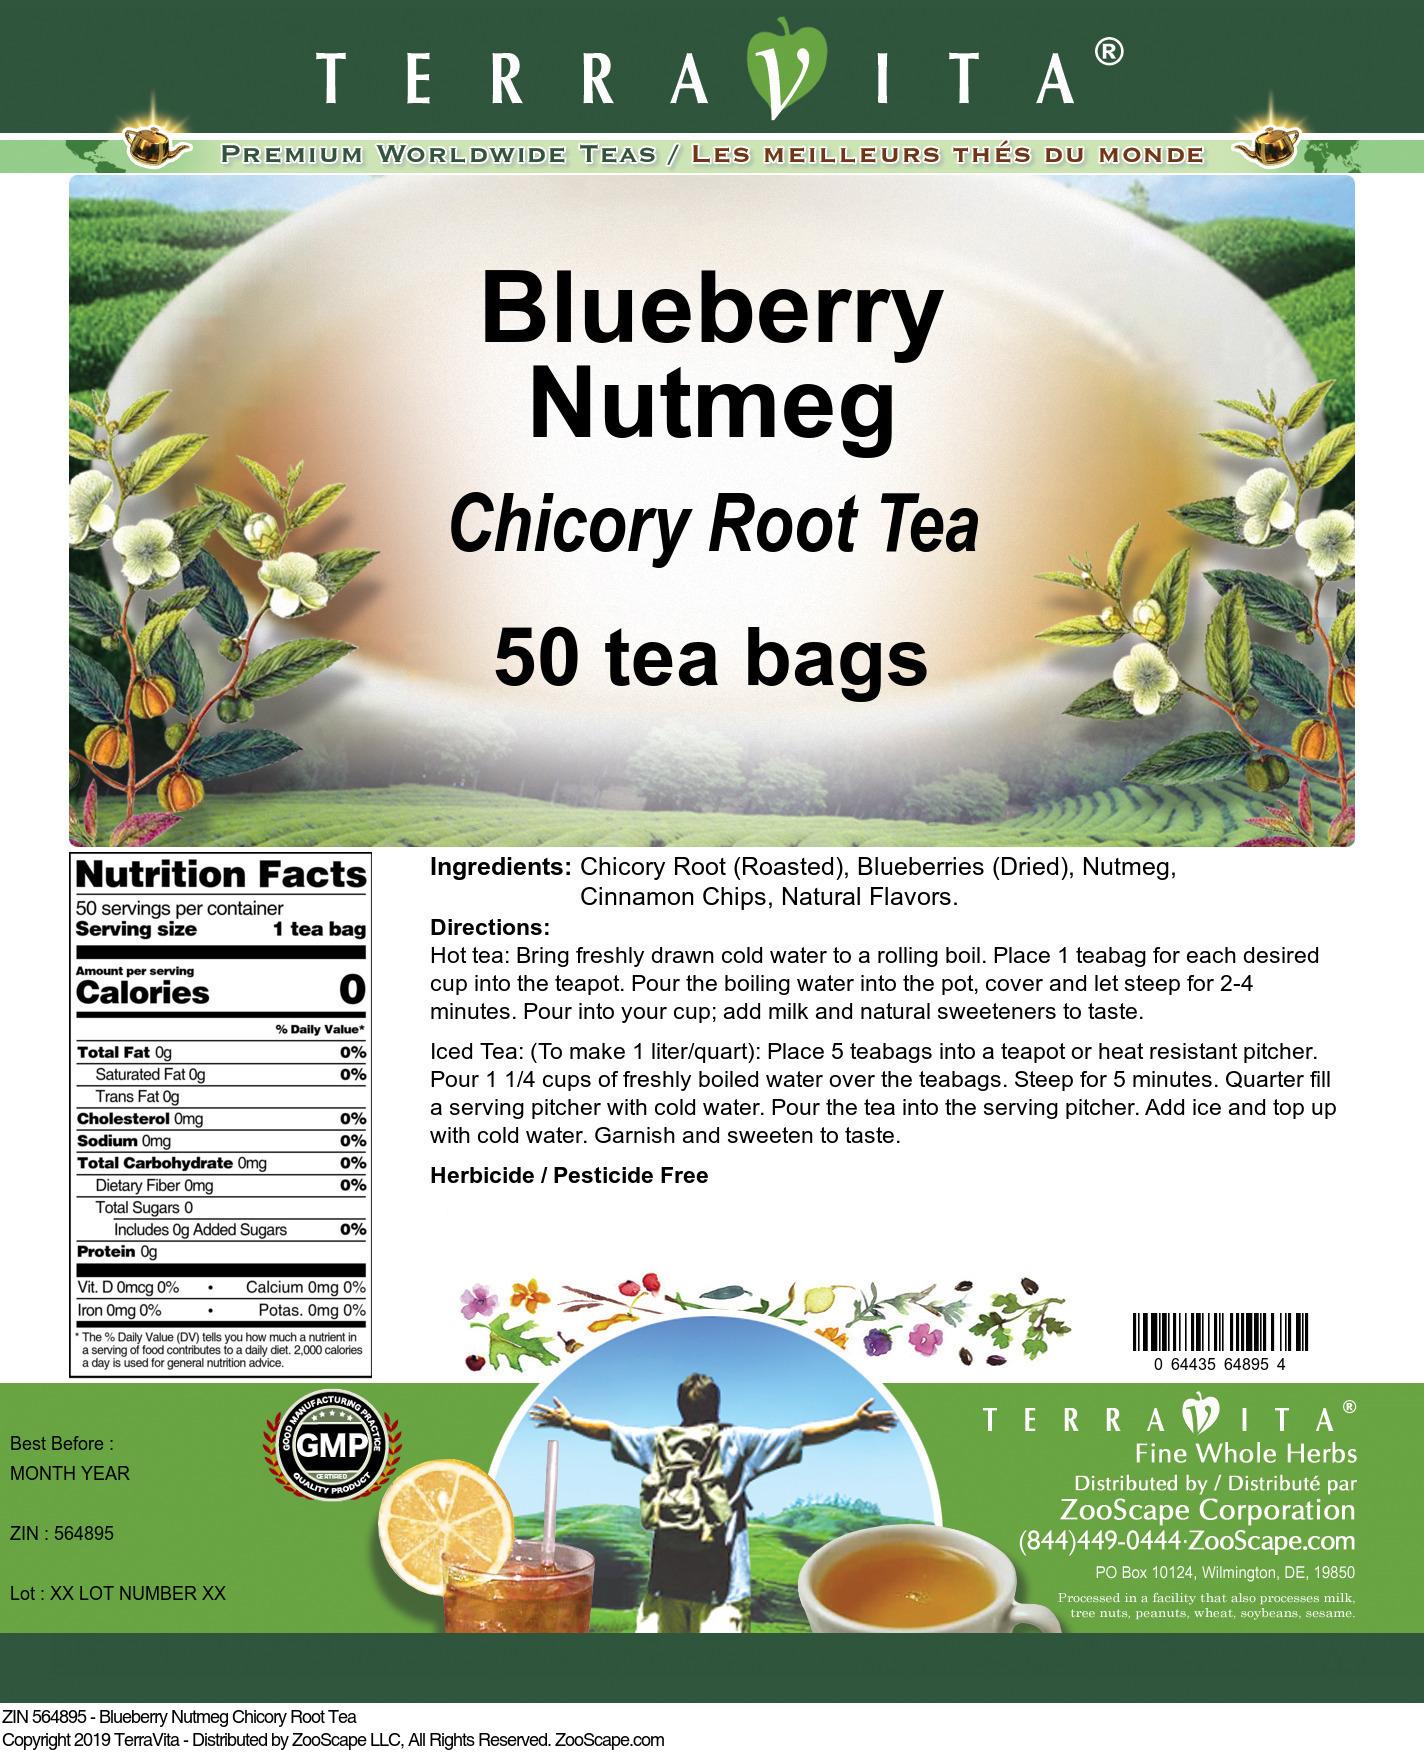 Blueberry Nutmeg Chicory Root Tea